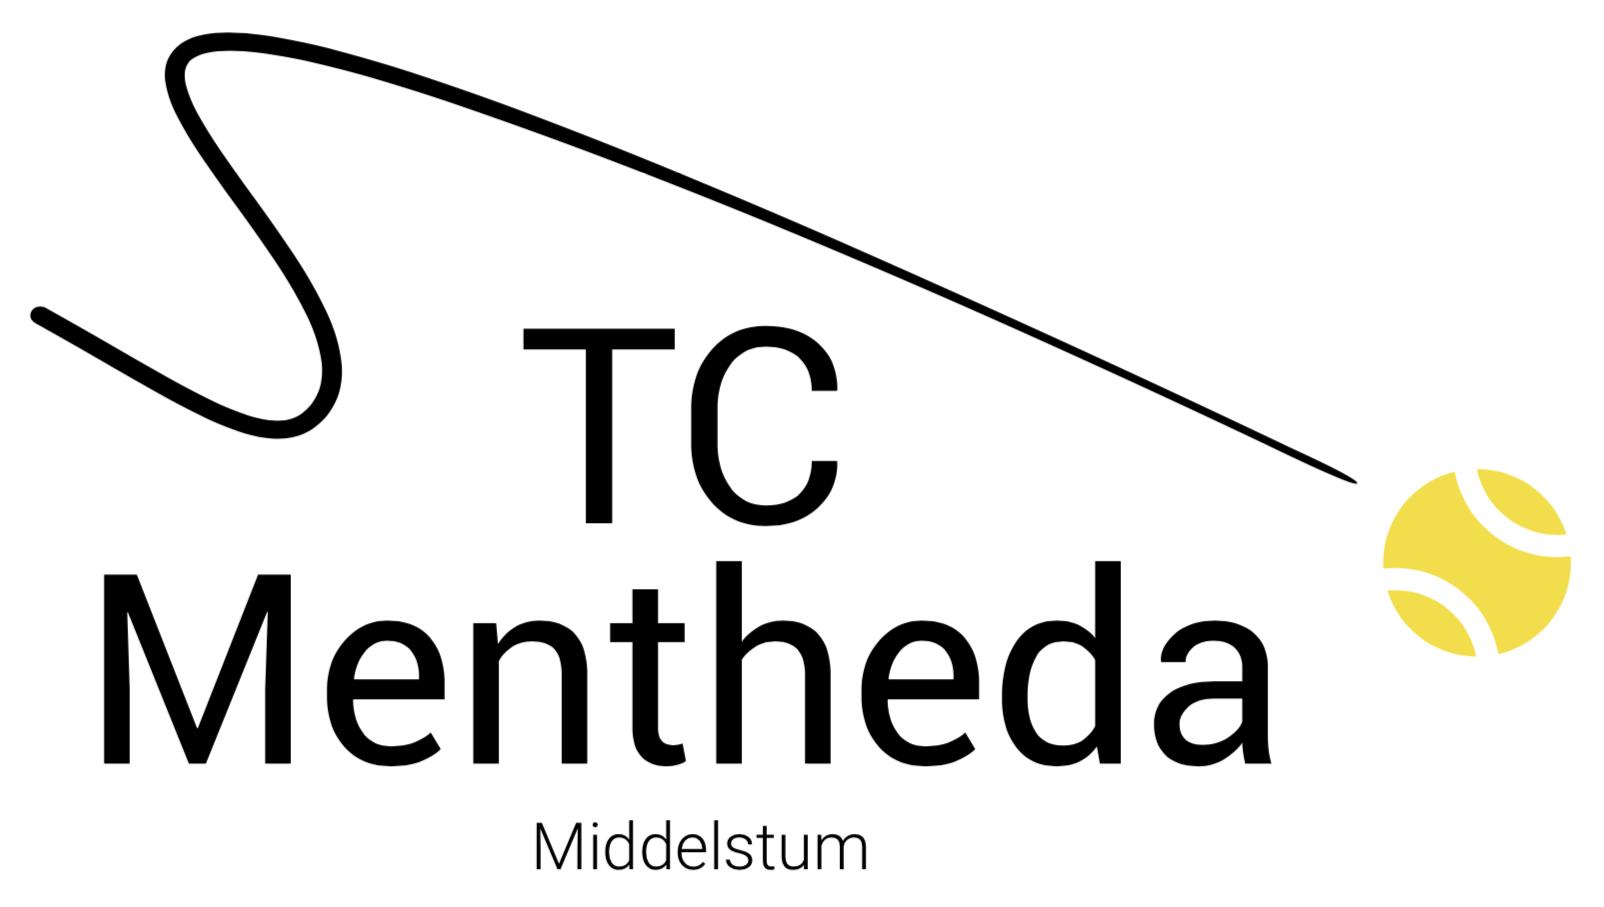 T.C. Mentheda